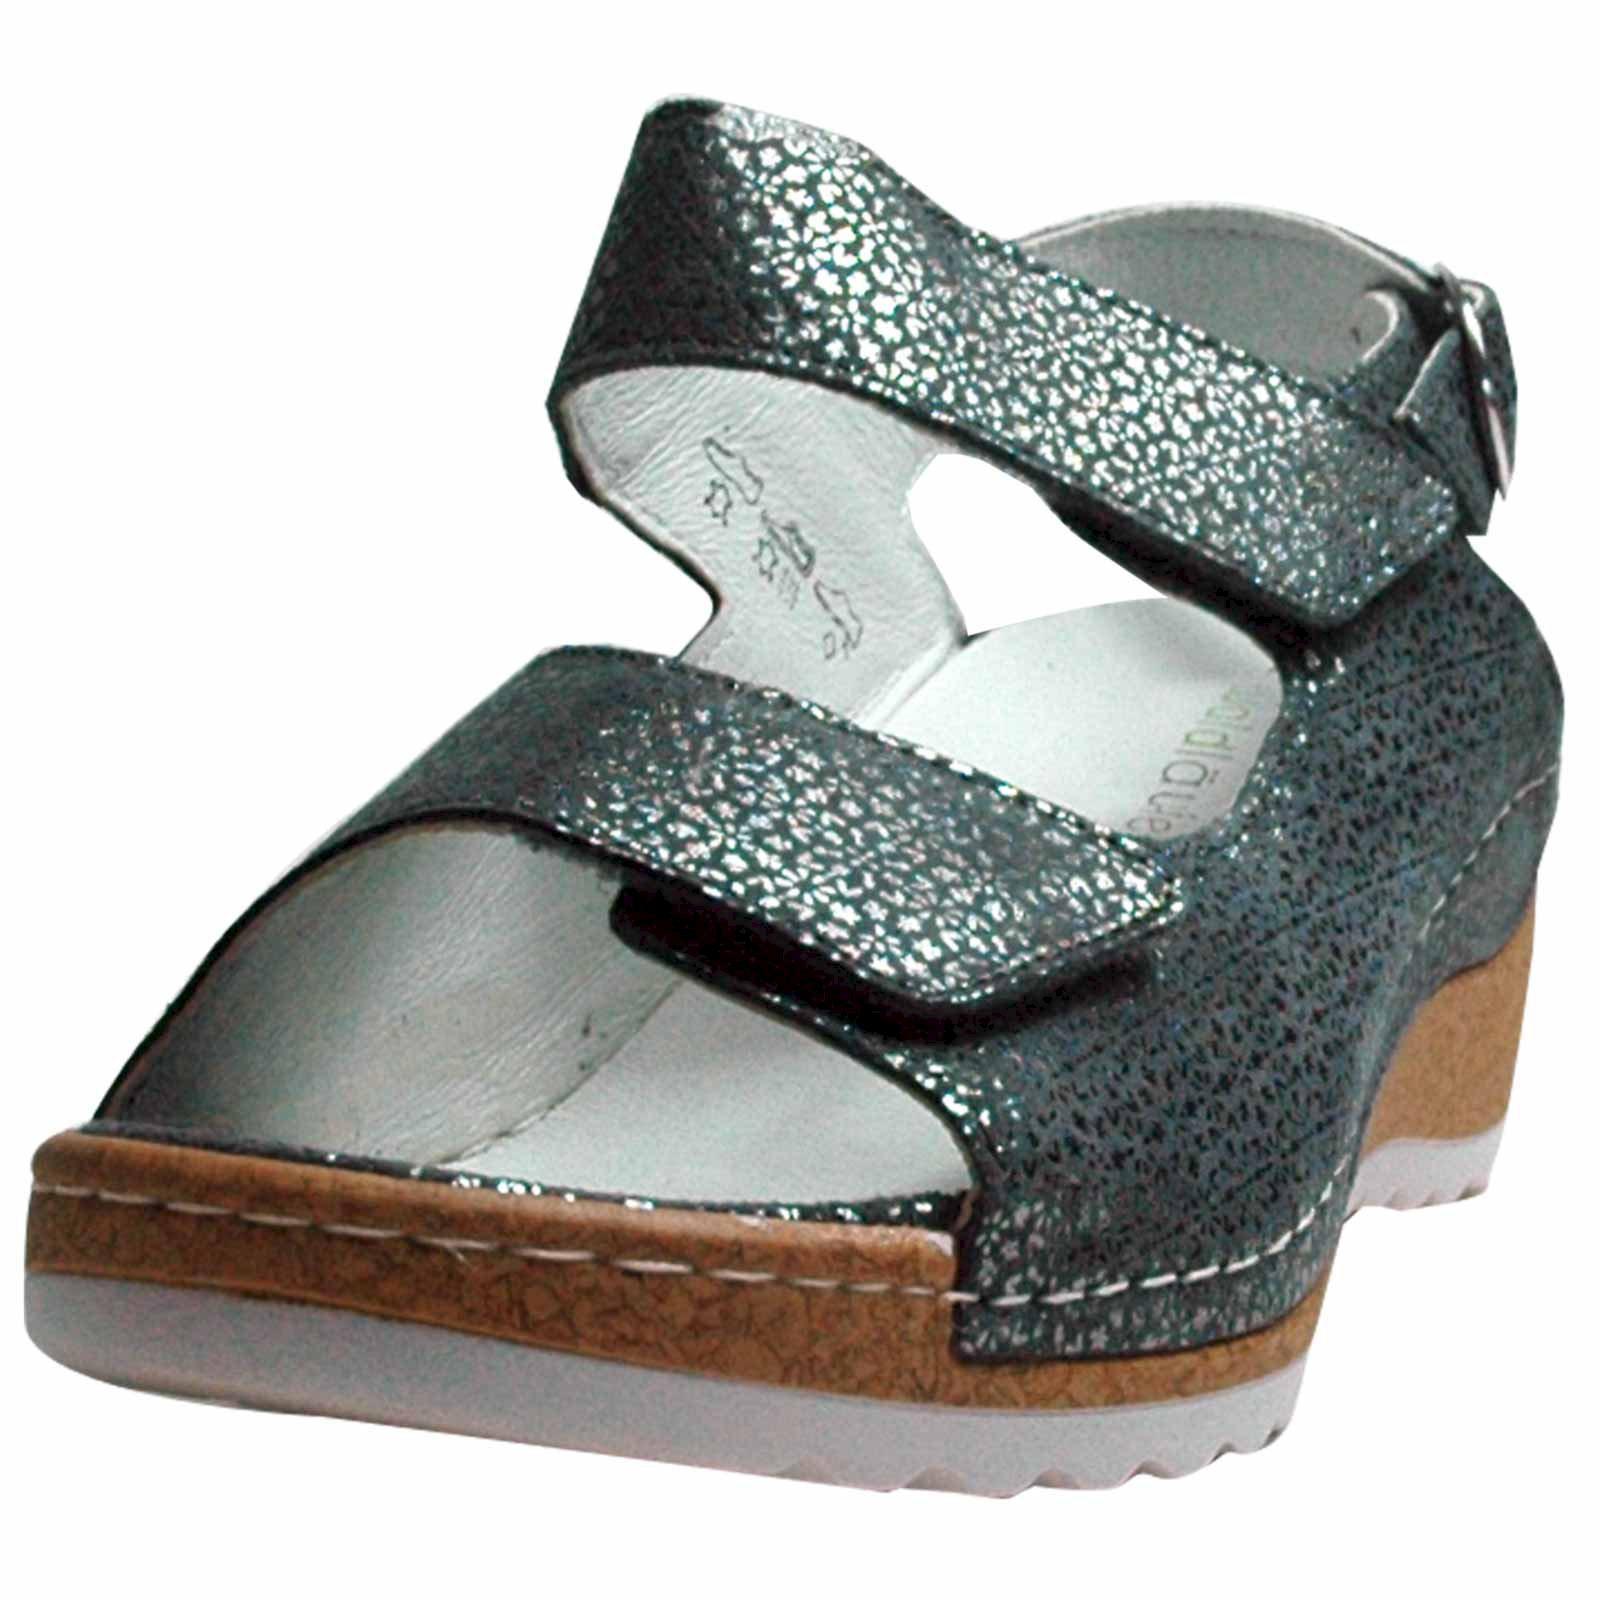 waldl ufer damen sandalen hanila tago cement weite h ebay. Black Bedroom Furniture Sets. Home Design Ideas